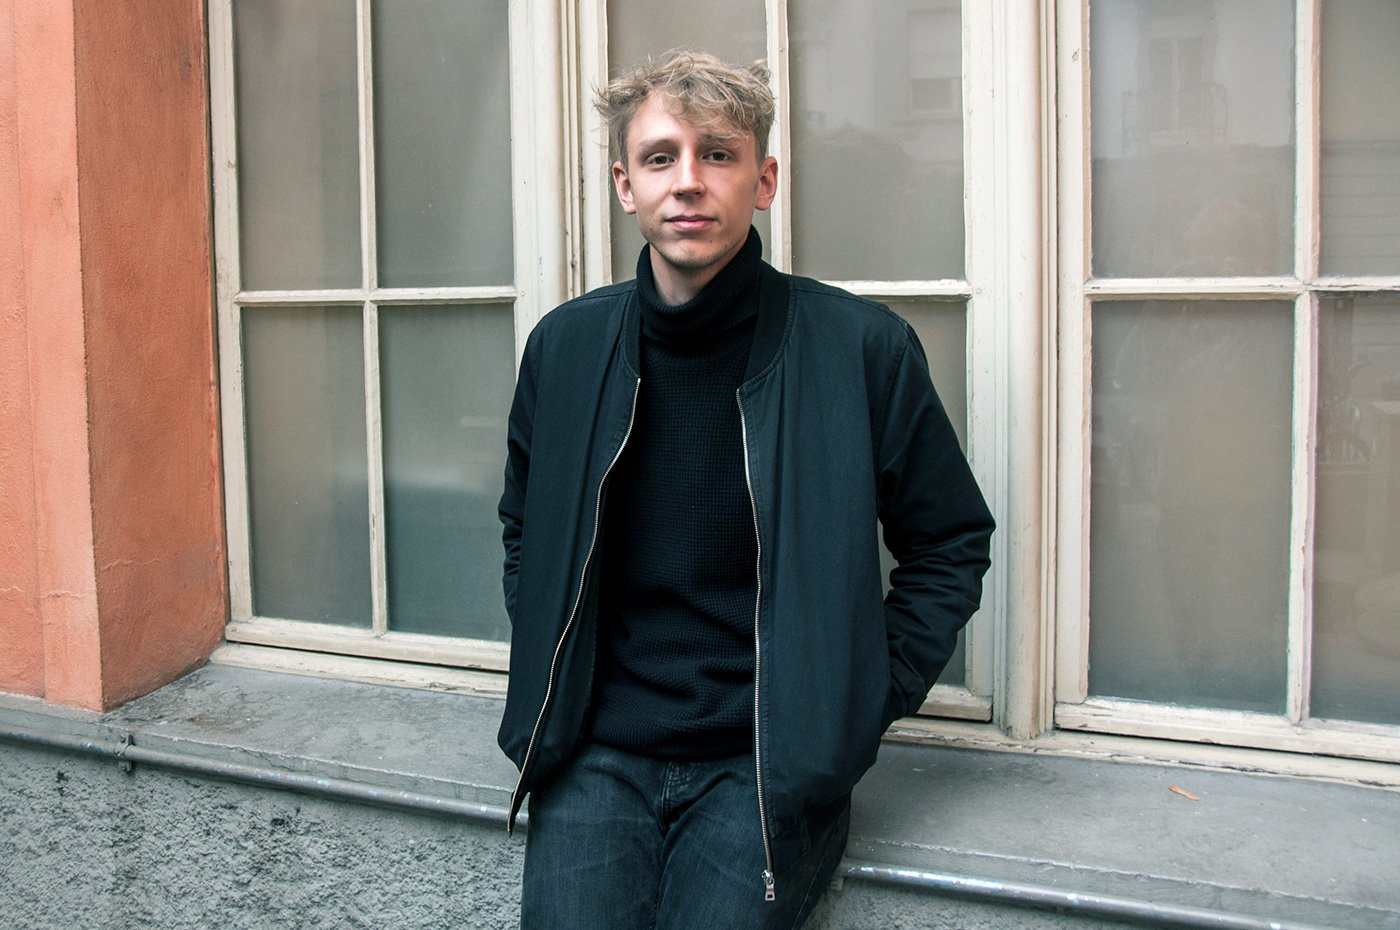 Denkt wohl auch in diesem Moment gerade an Musik: Sänger und Gitarrist Sebastian Meyer.